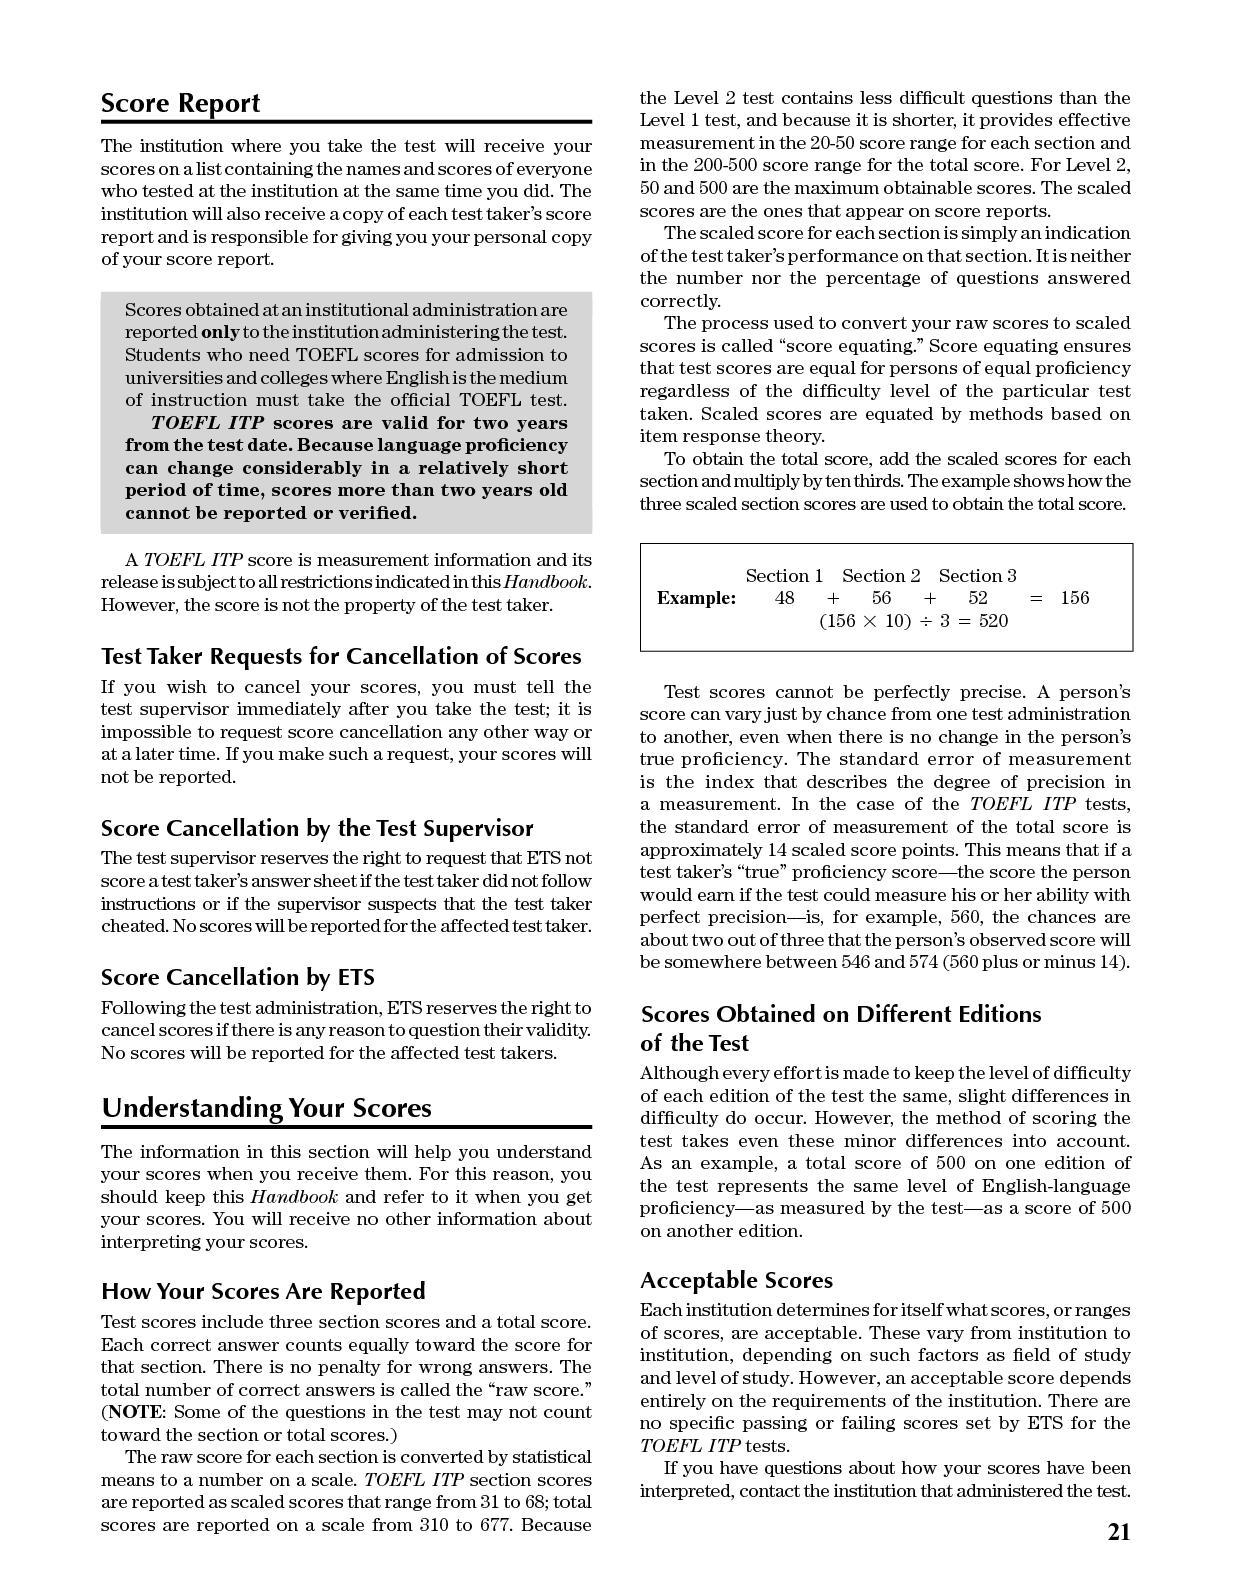 Toefl Itp Test Taker Handbook - CALAMEO Downloader